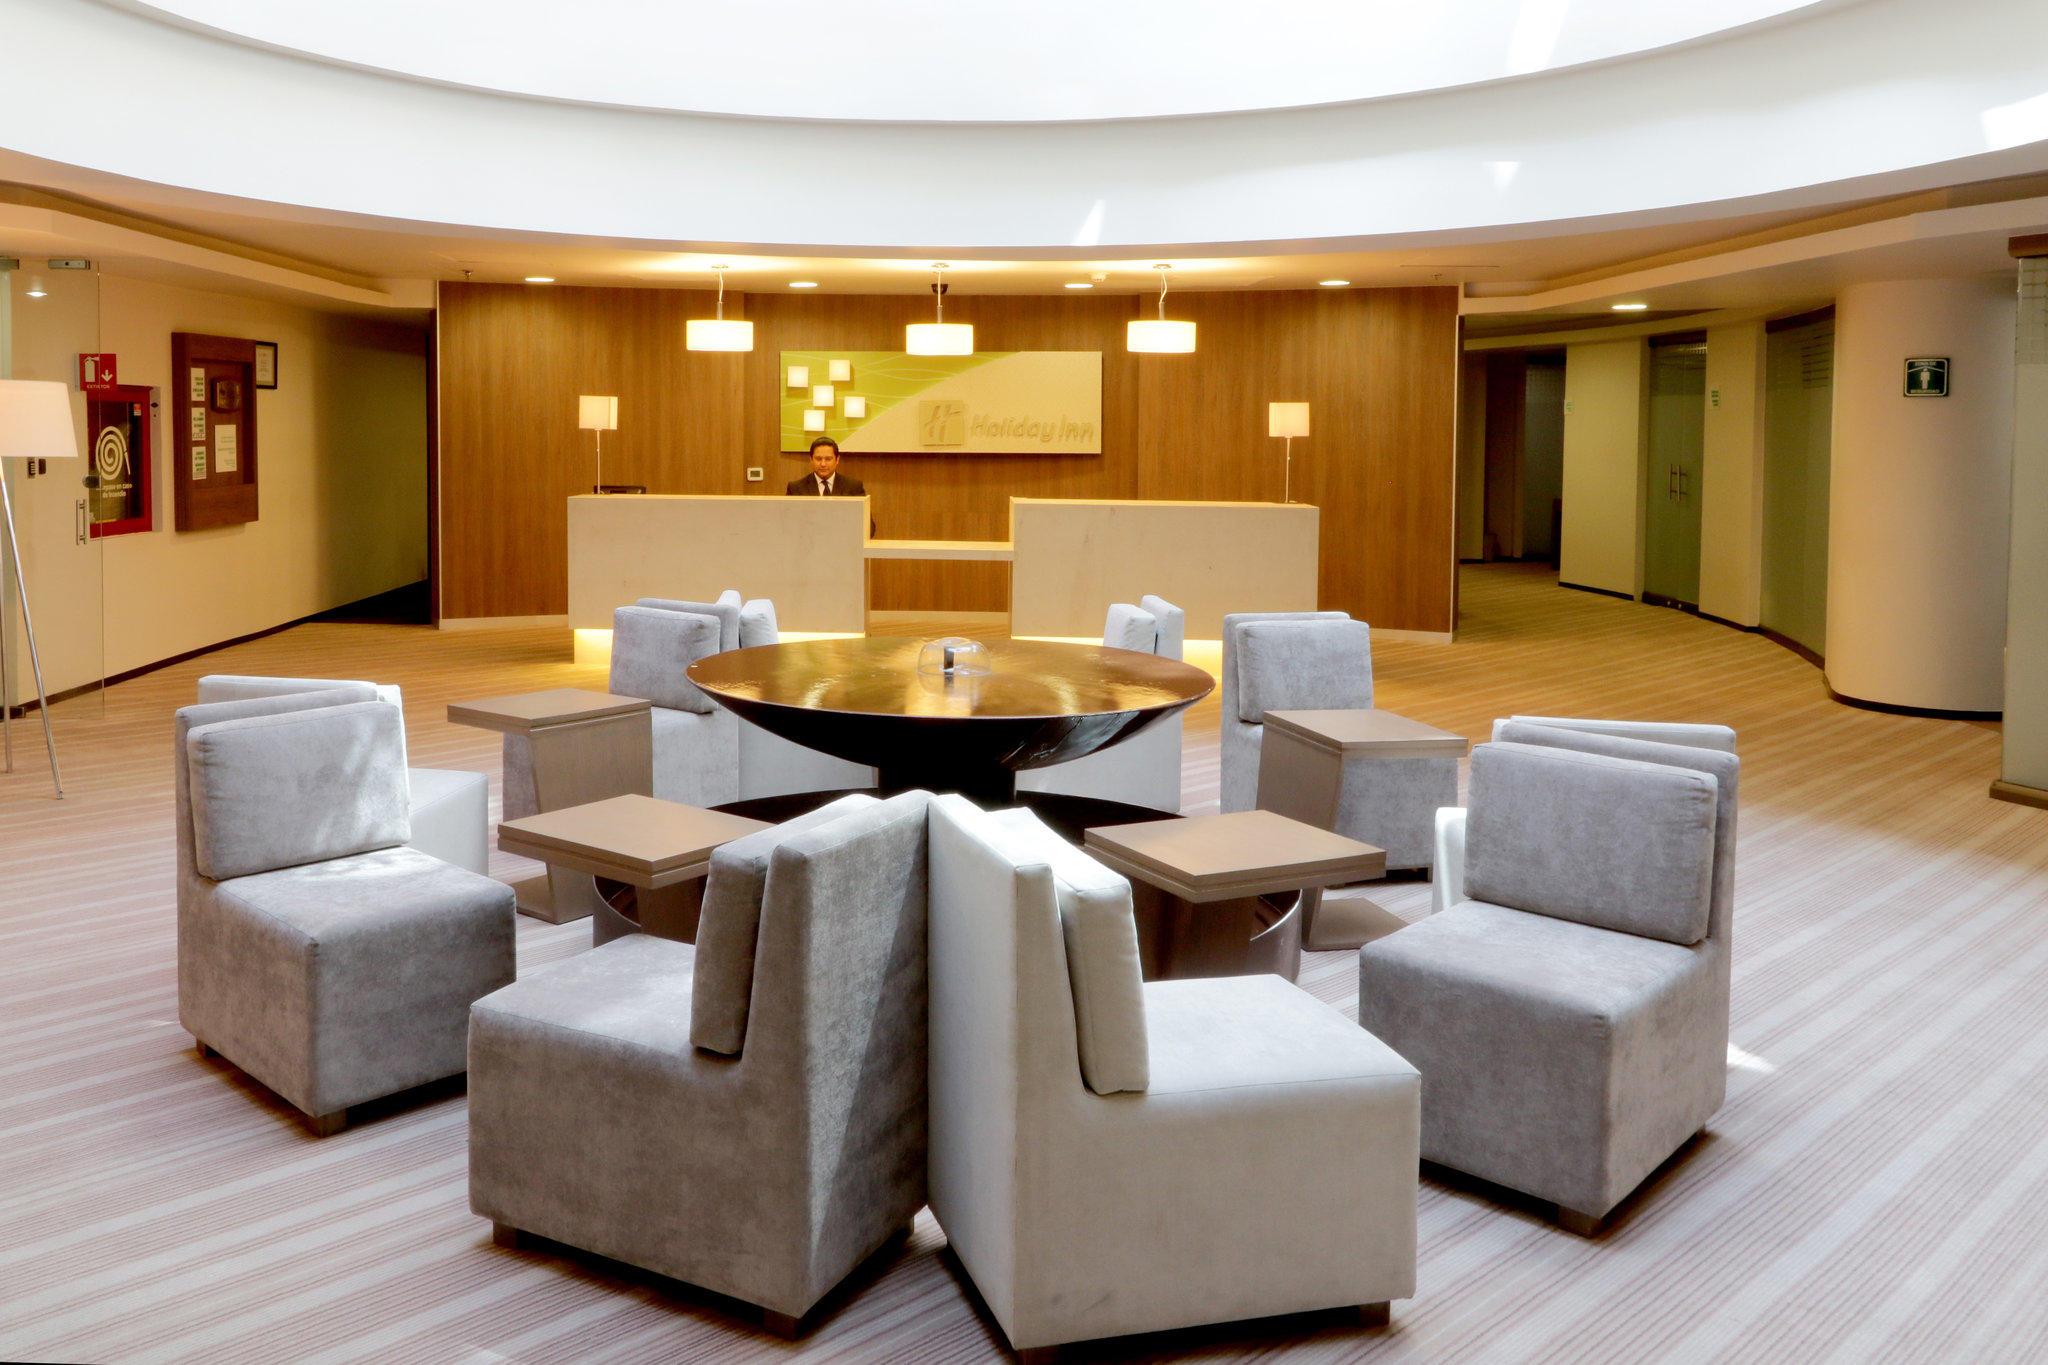 Holiday Inn & Suites Mexico Medica sur